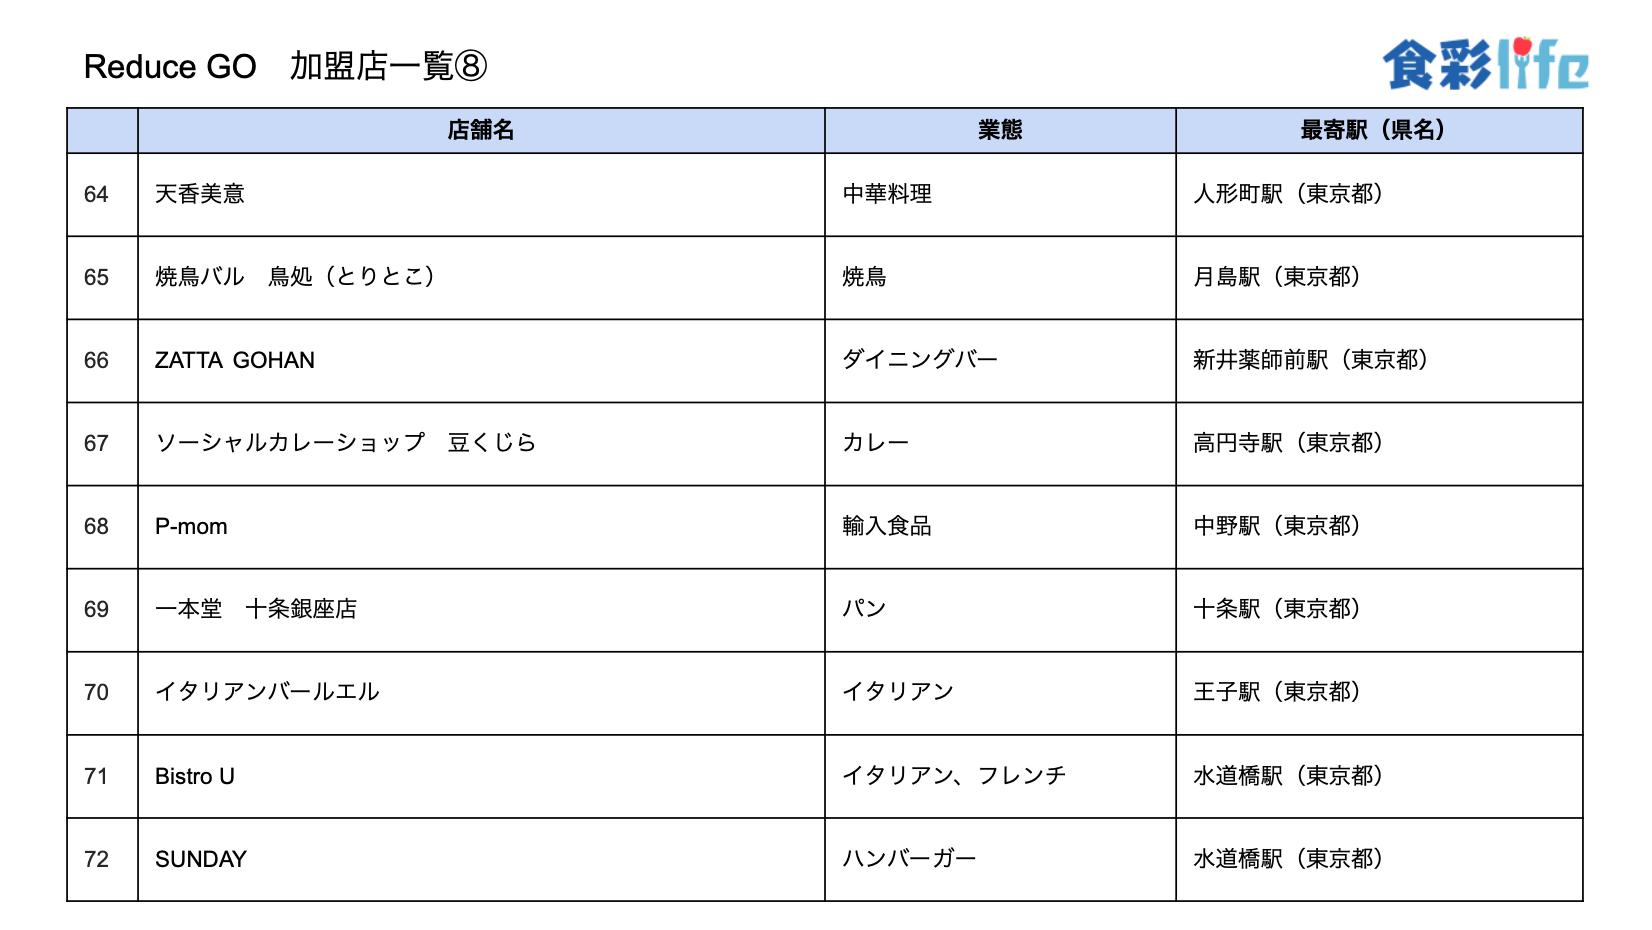 「ReduceGo」加盟店一覧8 (2020.3.18)